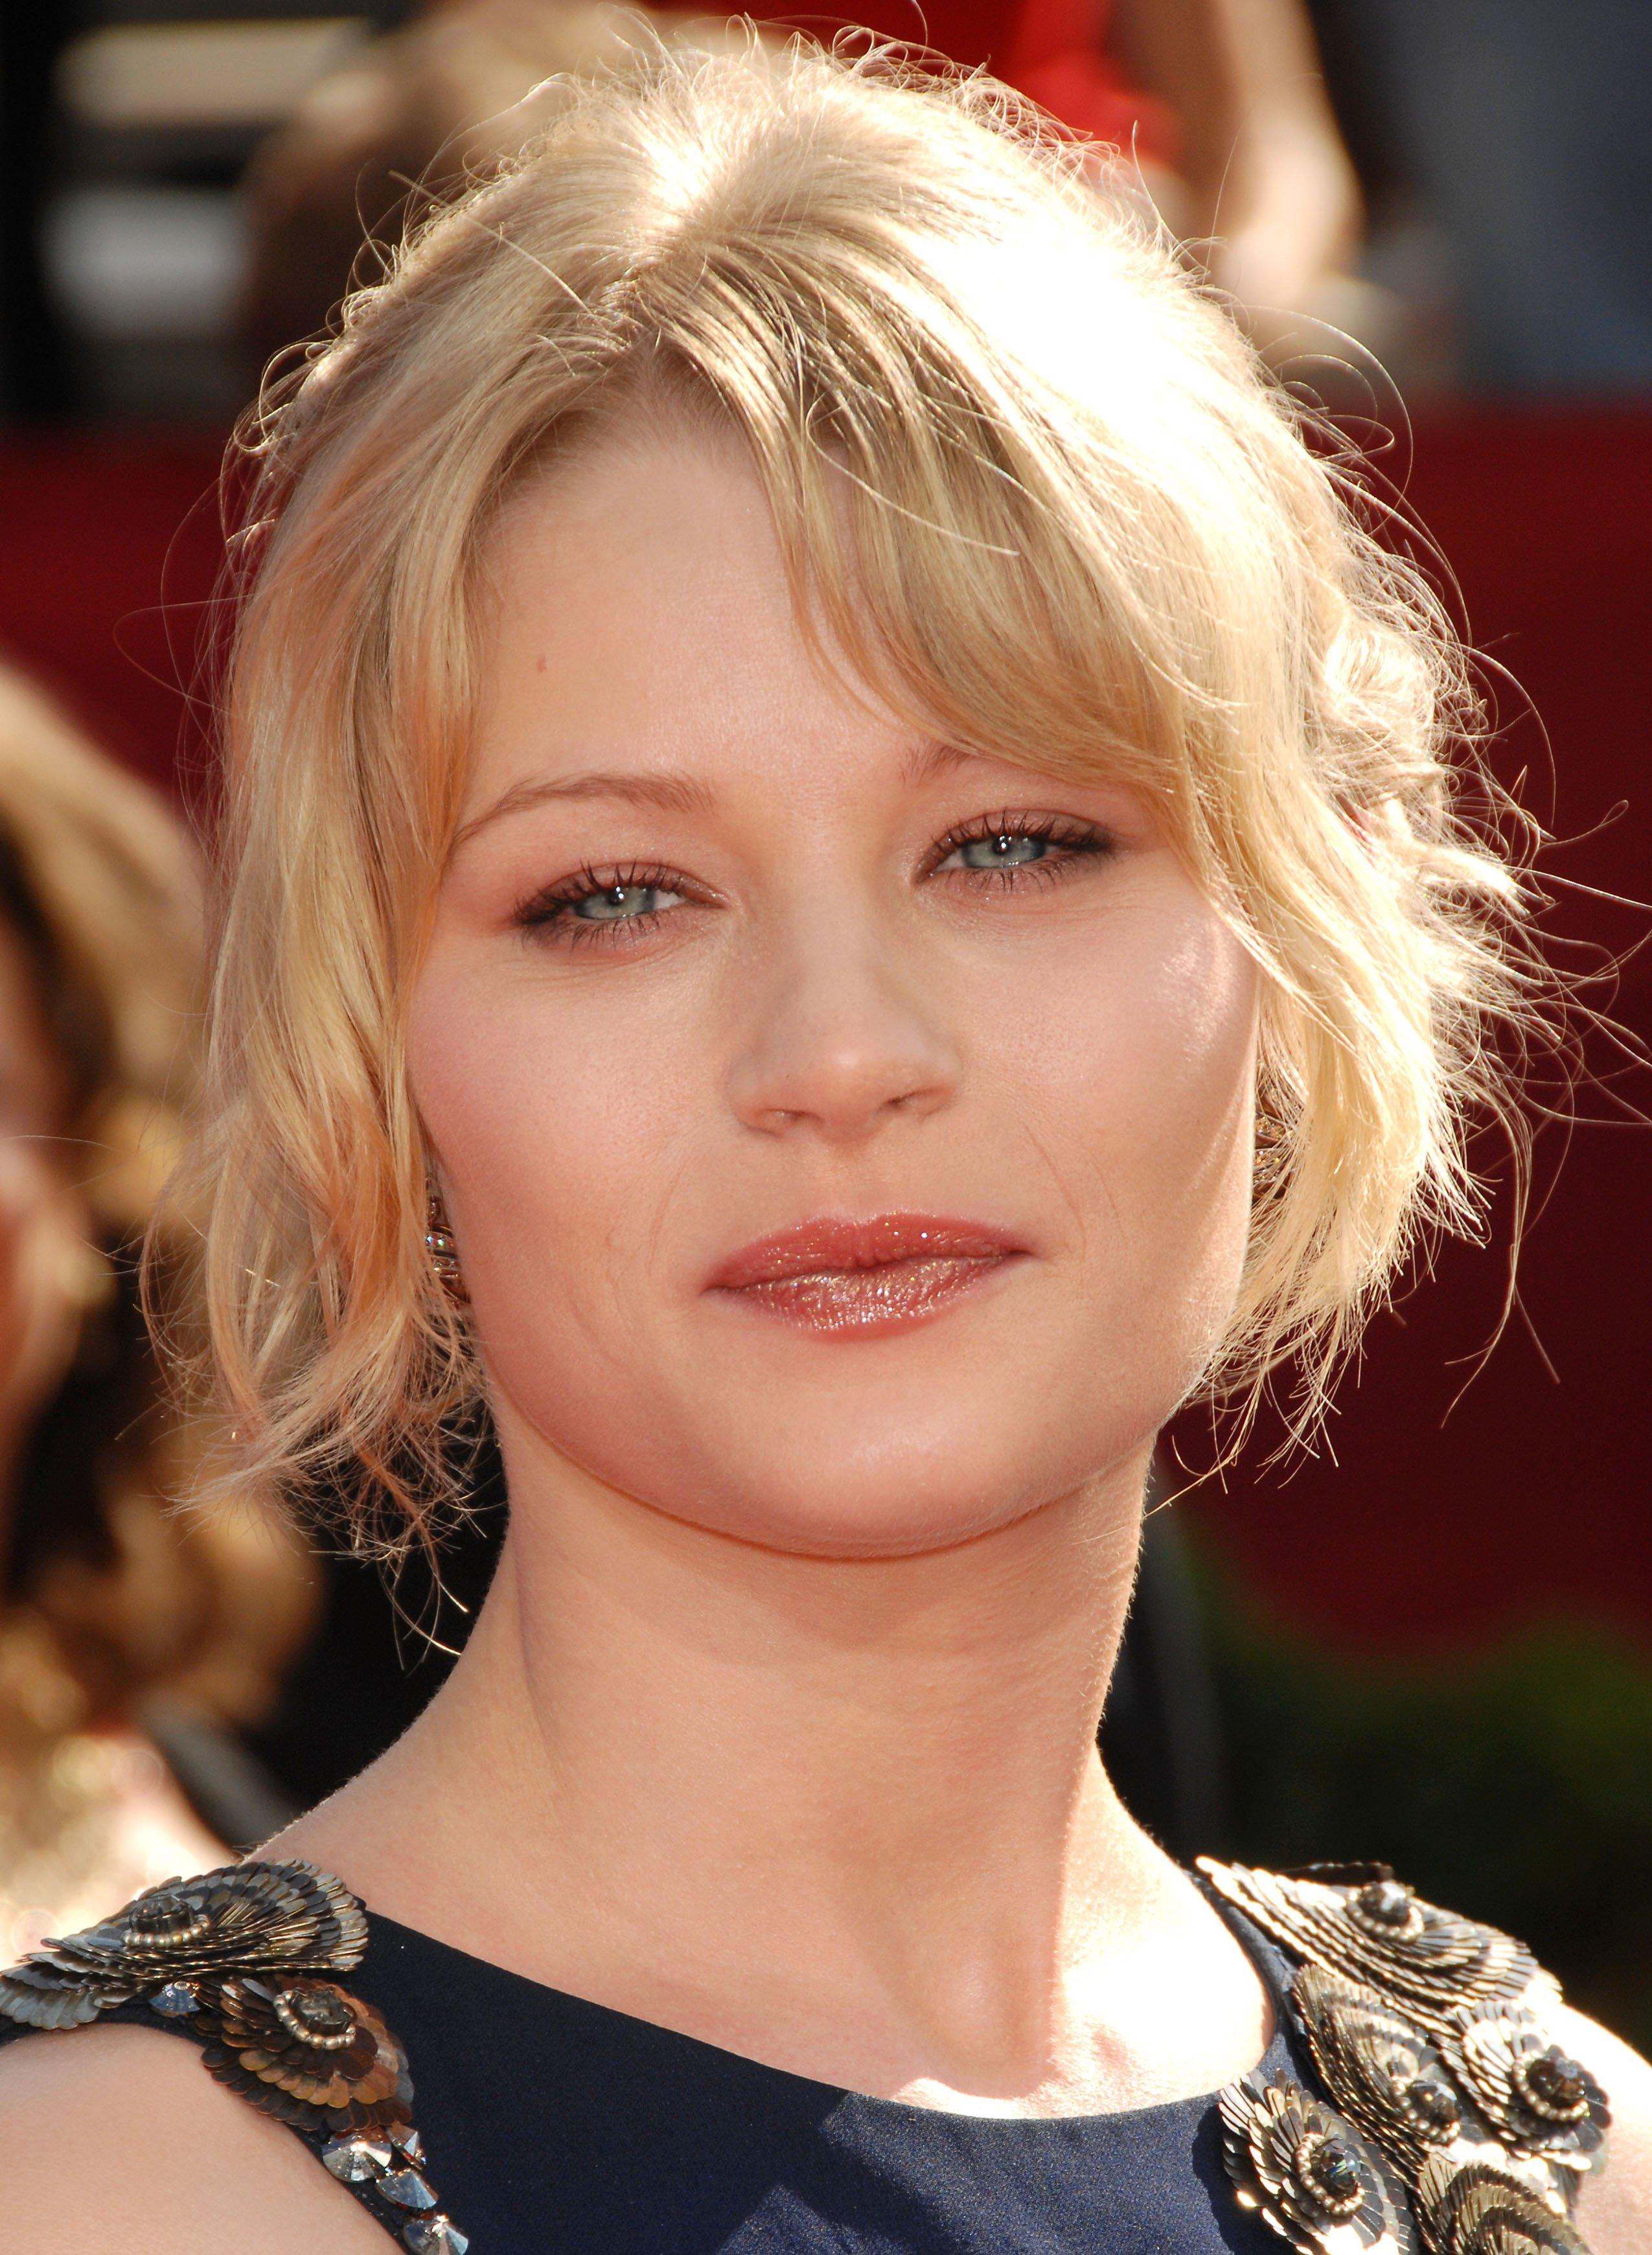 48408_Celebutopia-Emilie_de_Ravin_arrives_at_the_60th_Annual_Primetime_Emmy_Awards-13_122_598lo.jpg